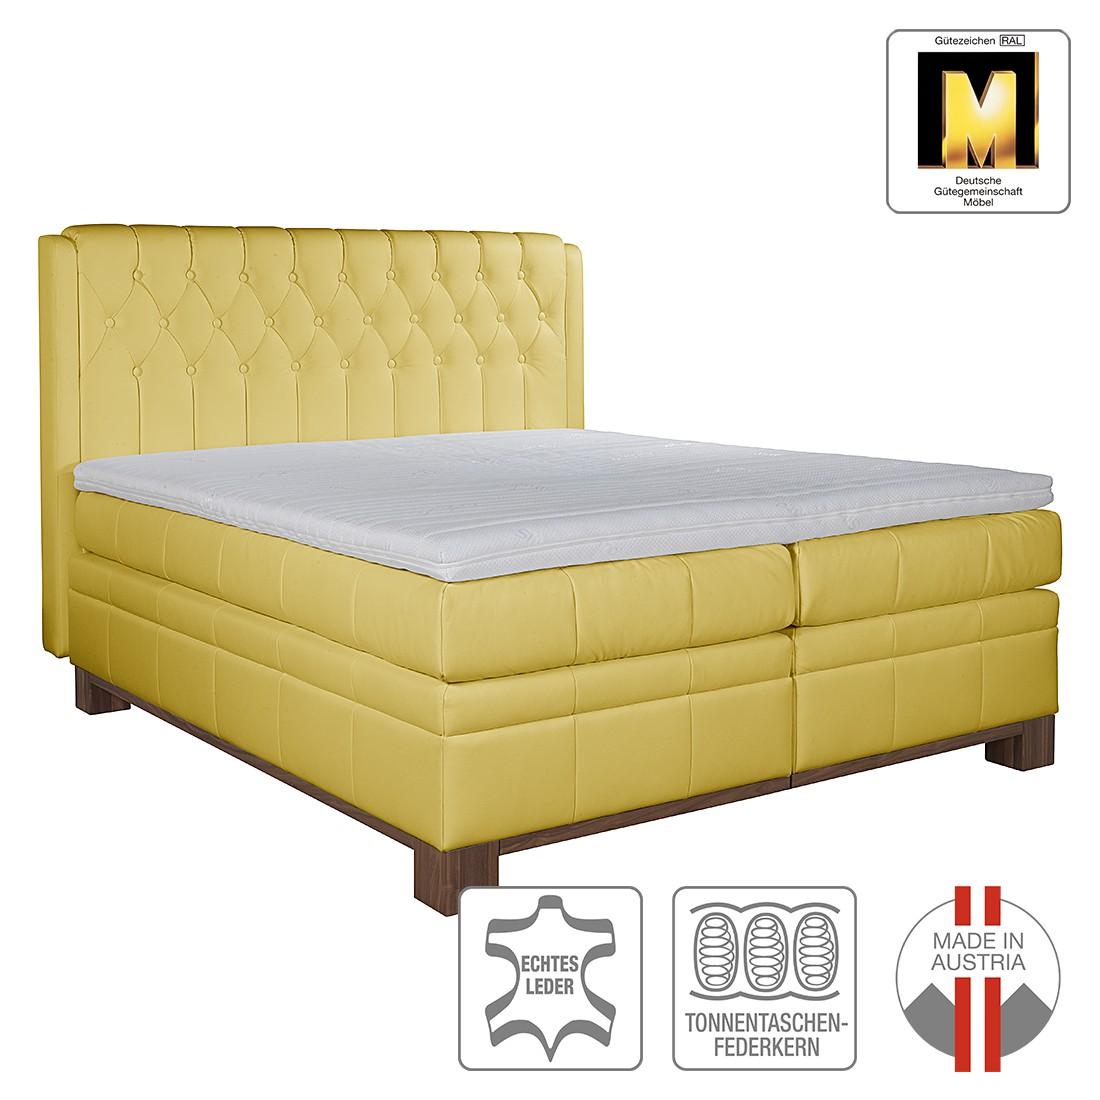 boxspringbett wellington 200 x 200cm h2 bis 80 kg. Black Bedroom Furniture Sets. Home Design Ideas